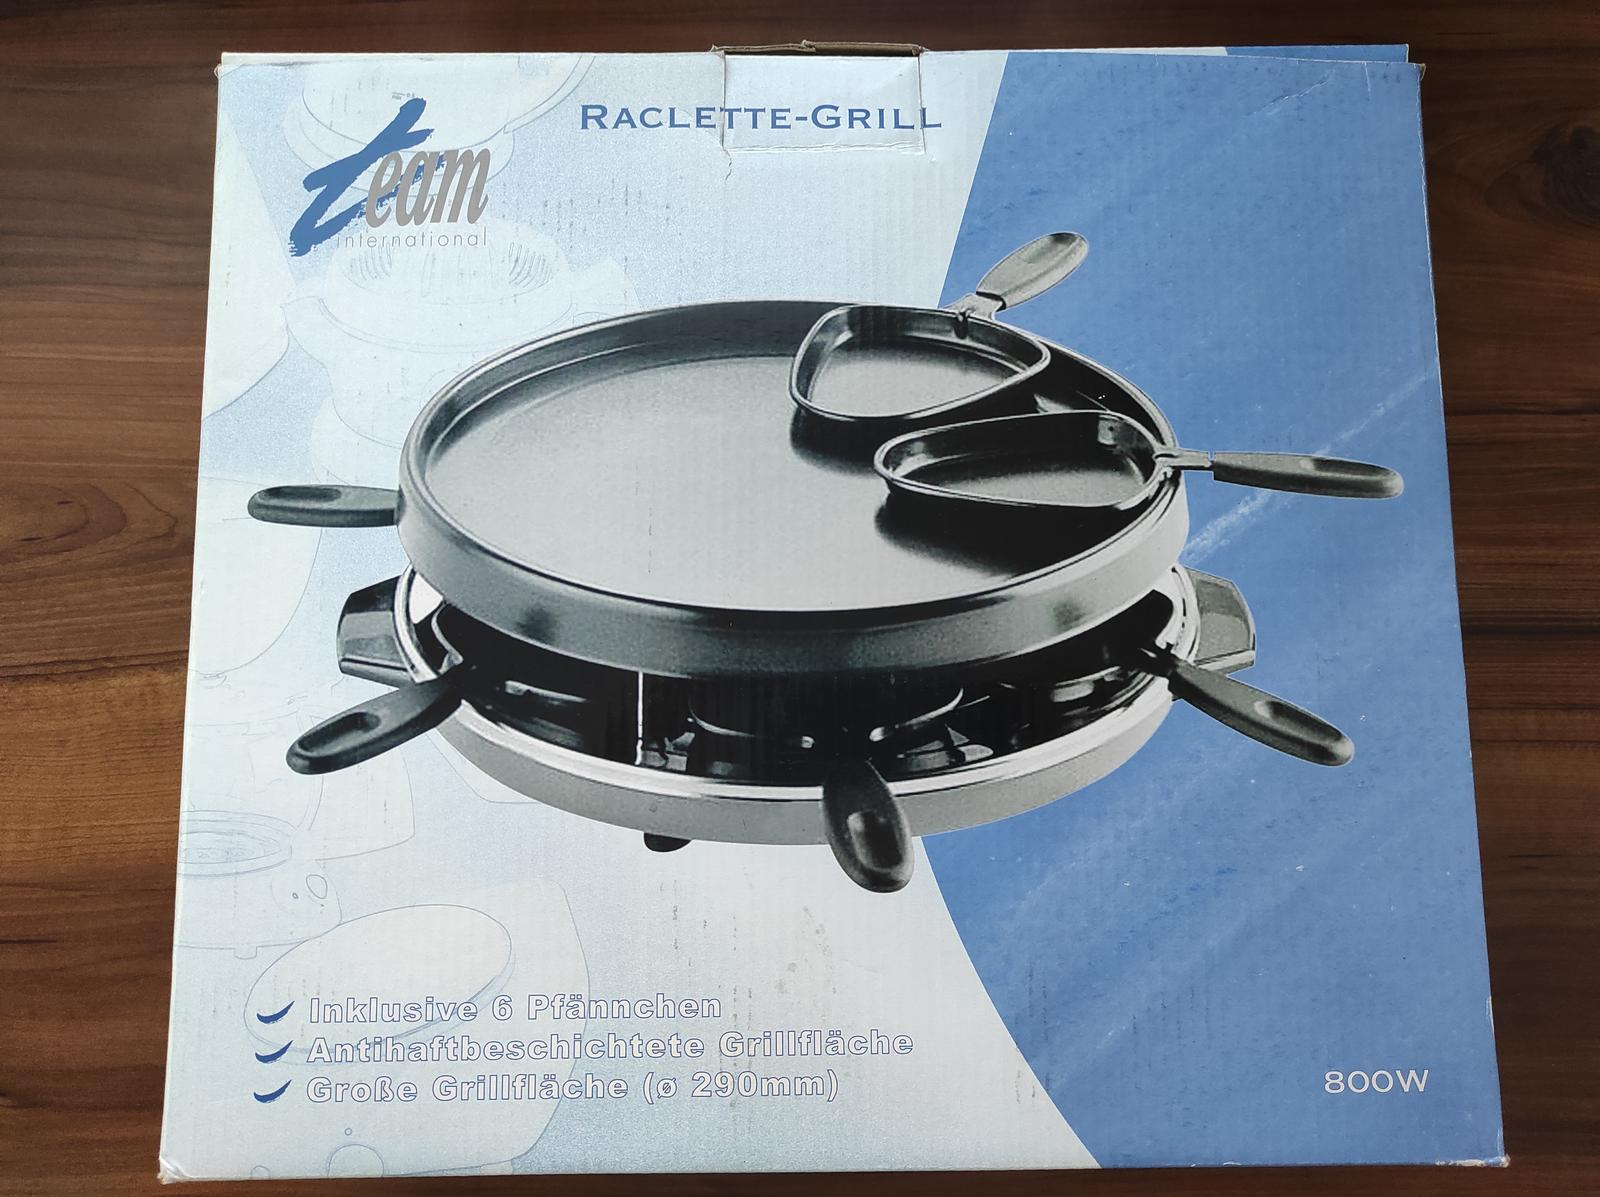 Elektricky raclette gril - Obrázok č. 1